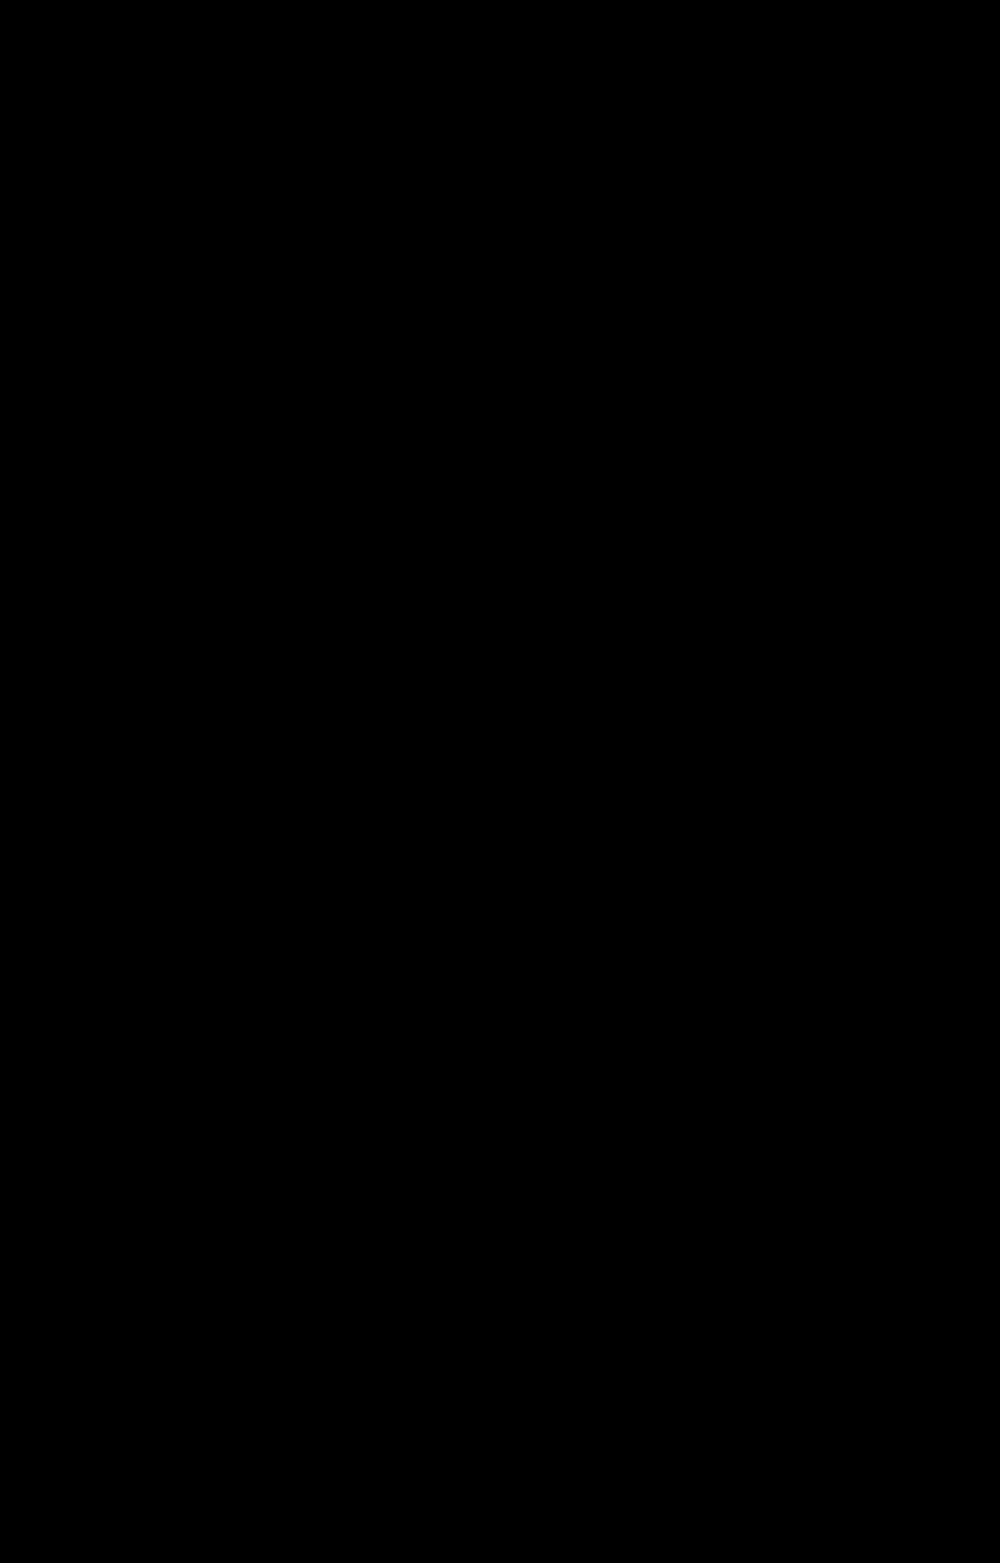 Le caraco dentelle